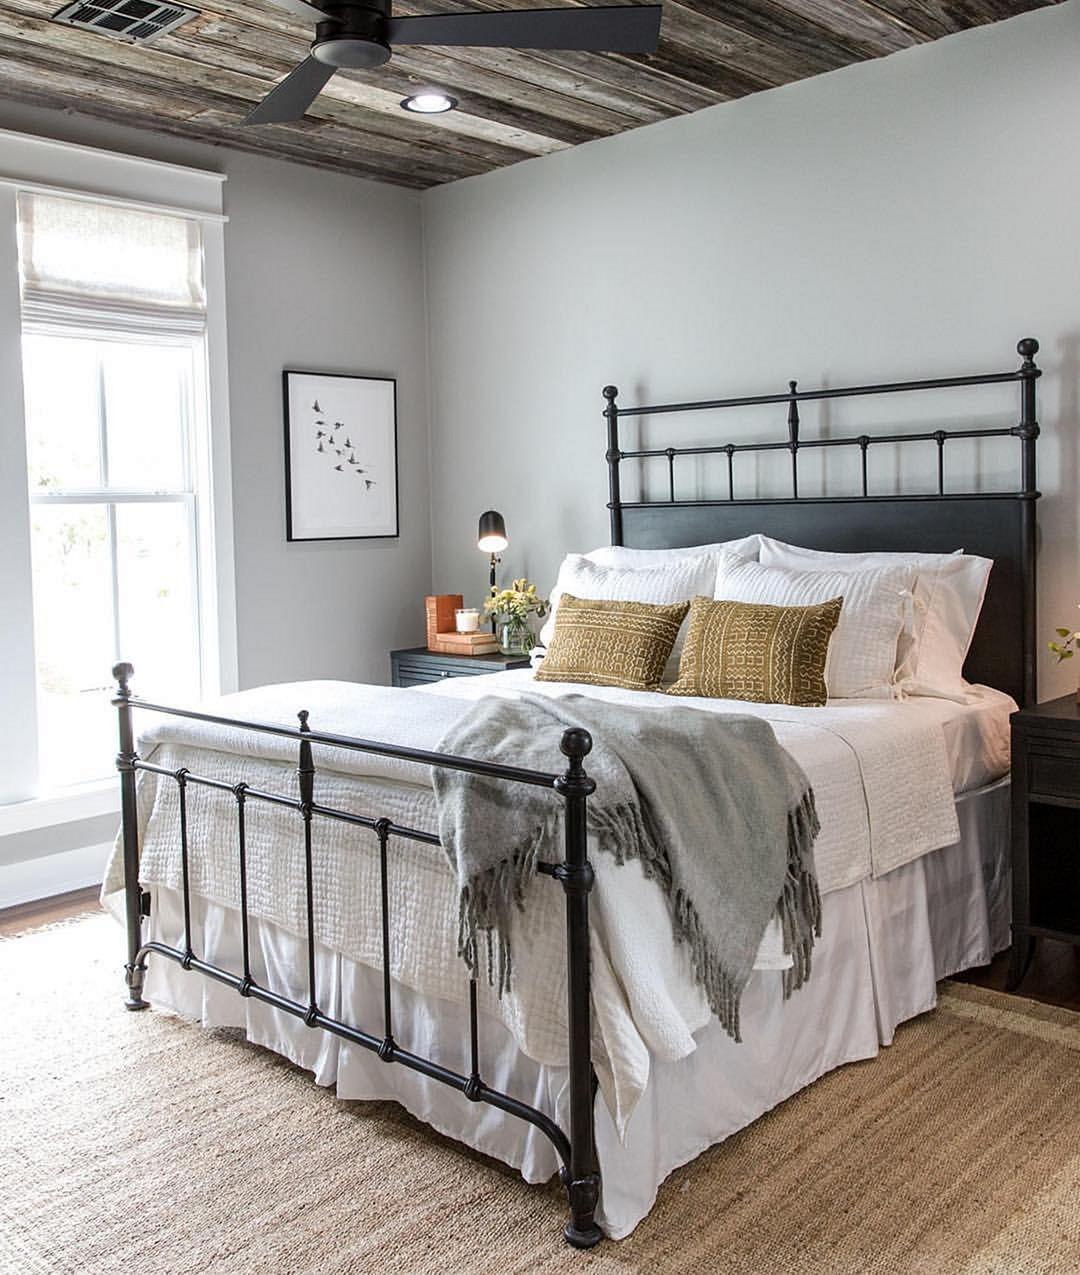 35 Stunning Magnolia Homes Bedroom Design Ideas For ... on Comfortable Bedroom Ideas  id=50833